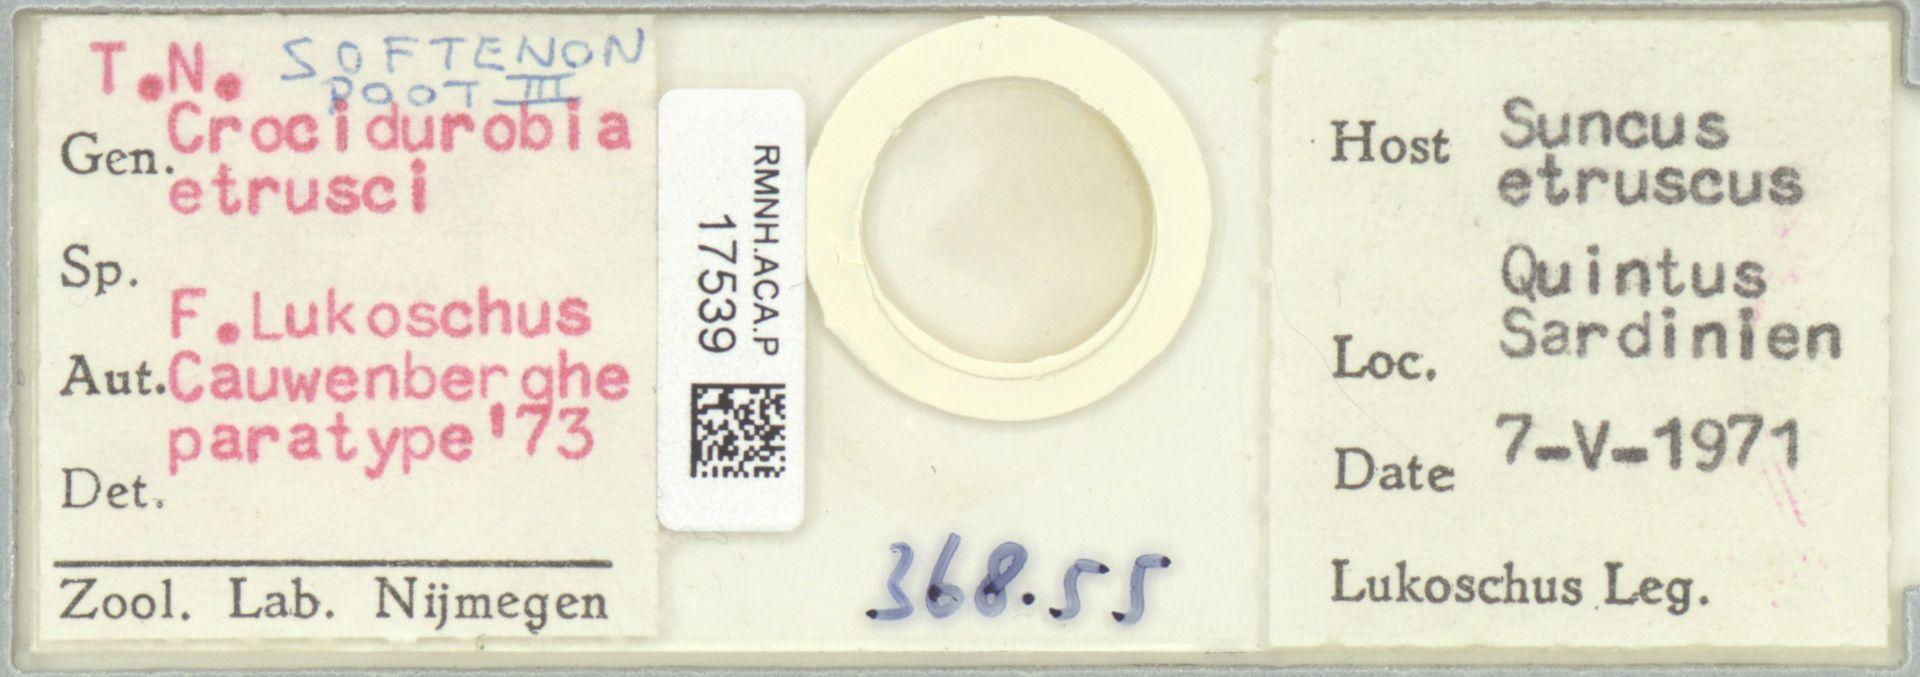 RMNH.ACA.P.17539 | Crocidurobia etrusci F. Lukoschus, Cauwenberghe